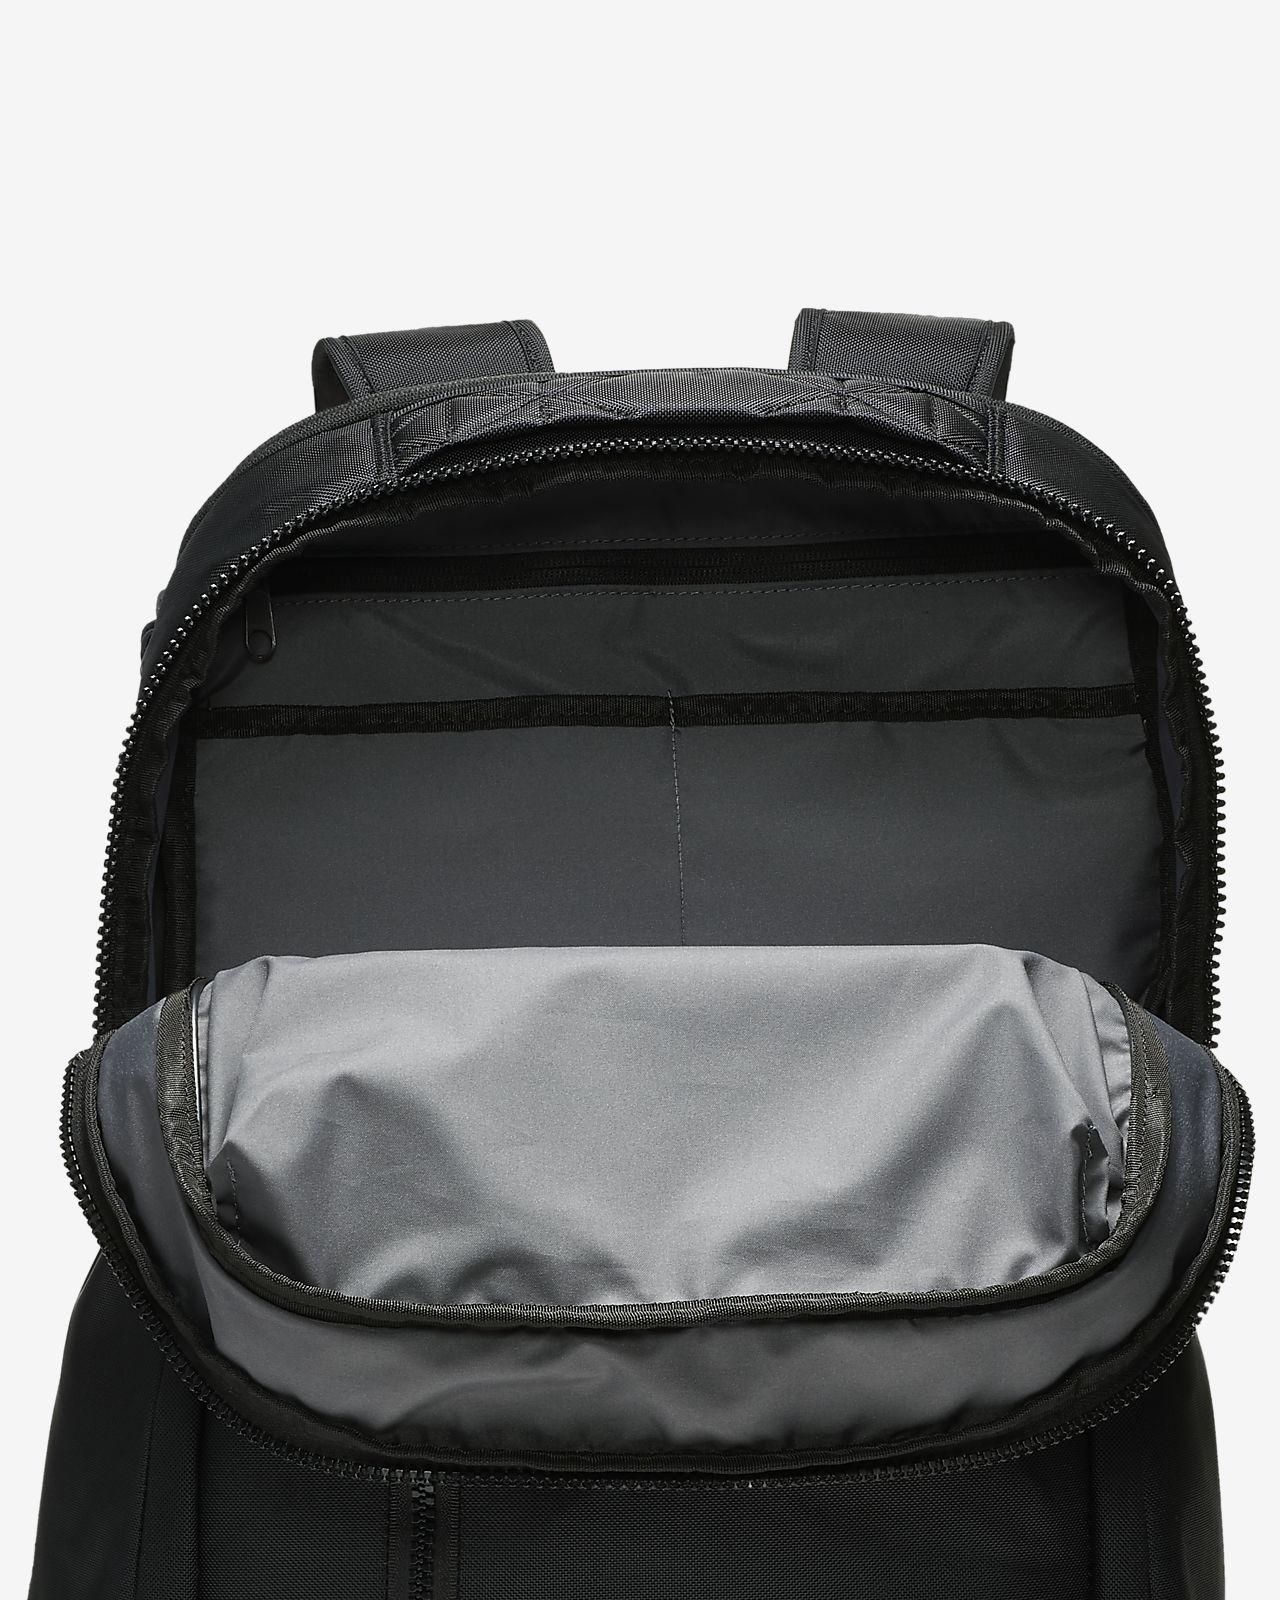 b6640d0407eb Nike Vapor Power 2.0 Training Backpack. Nike.com CA